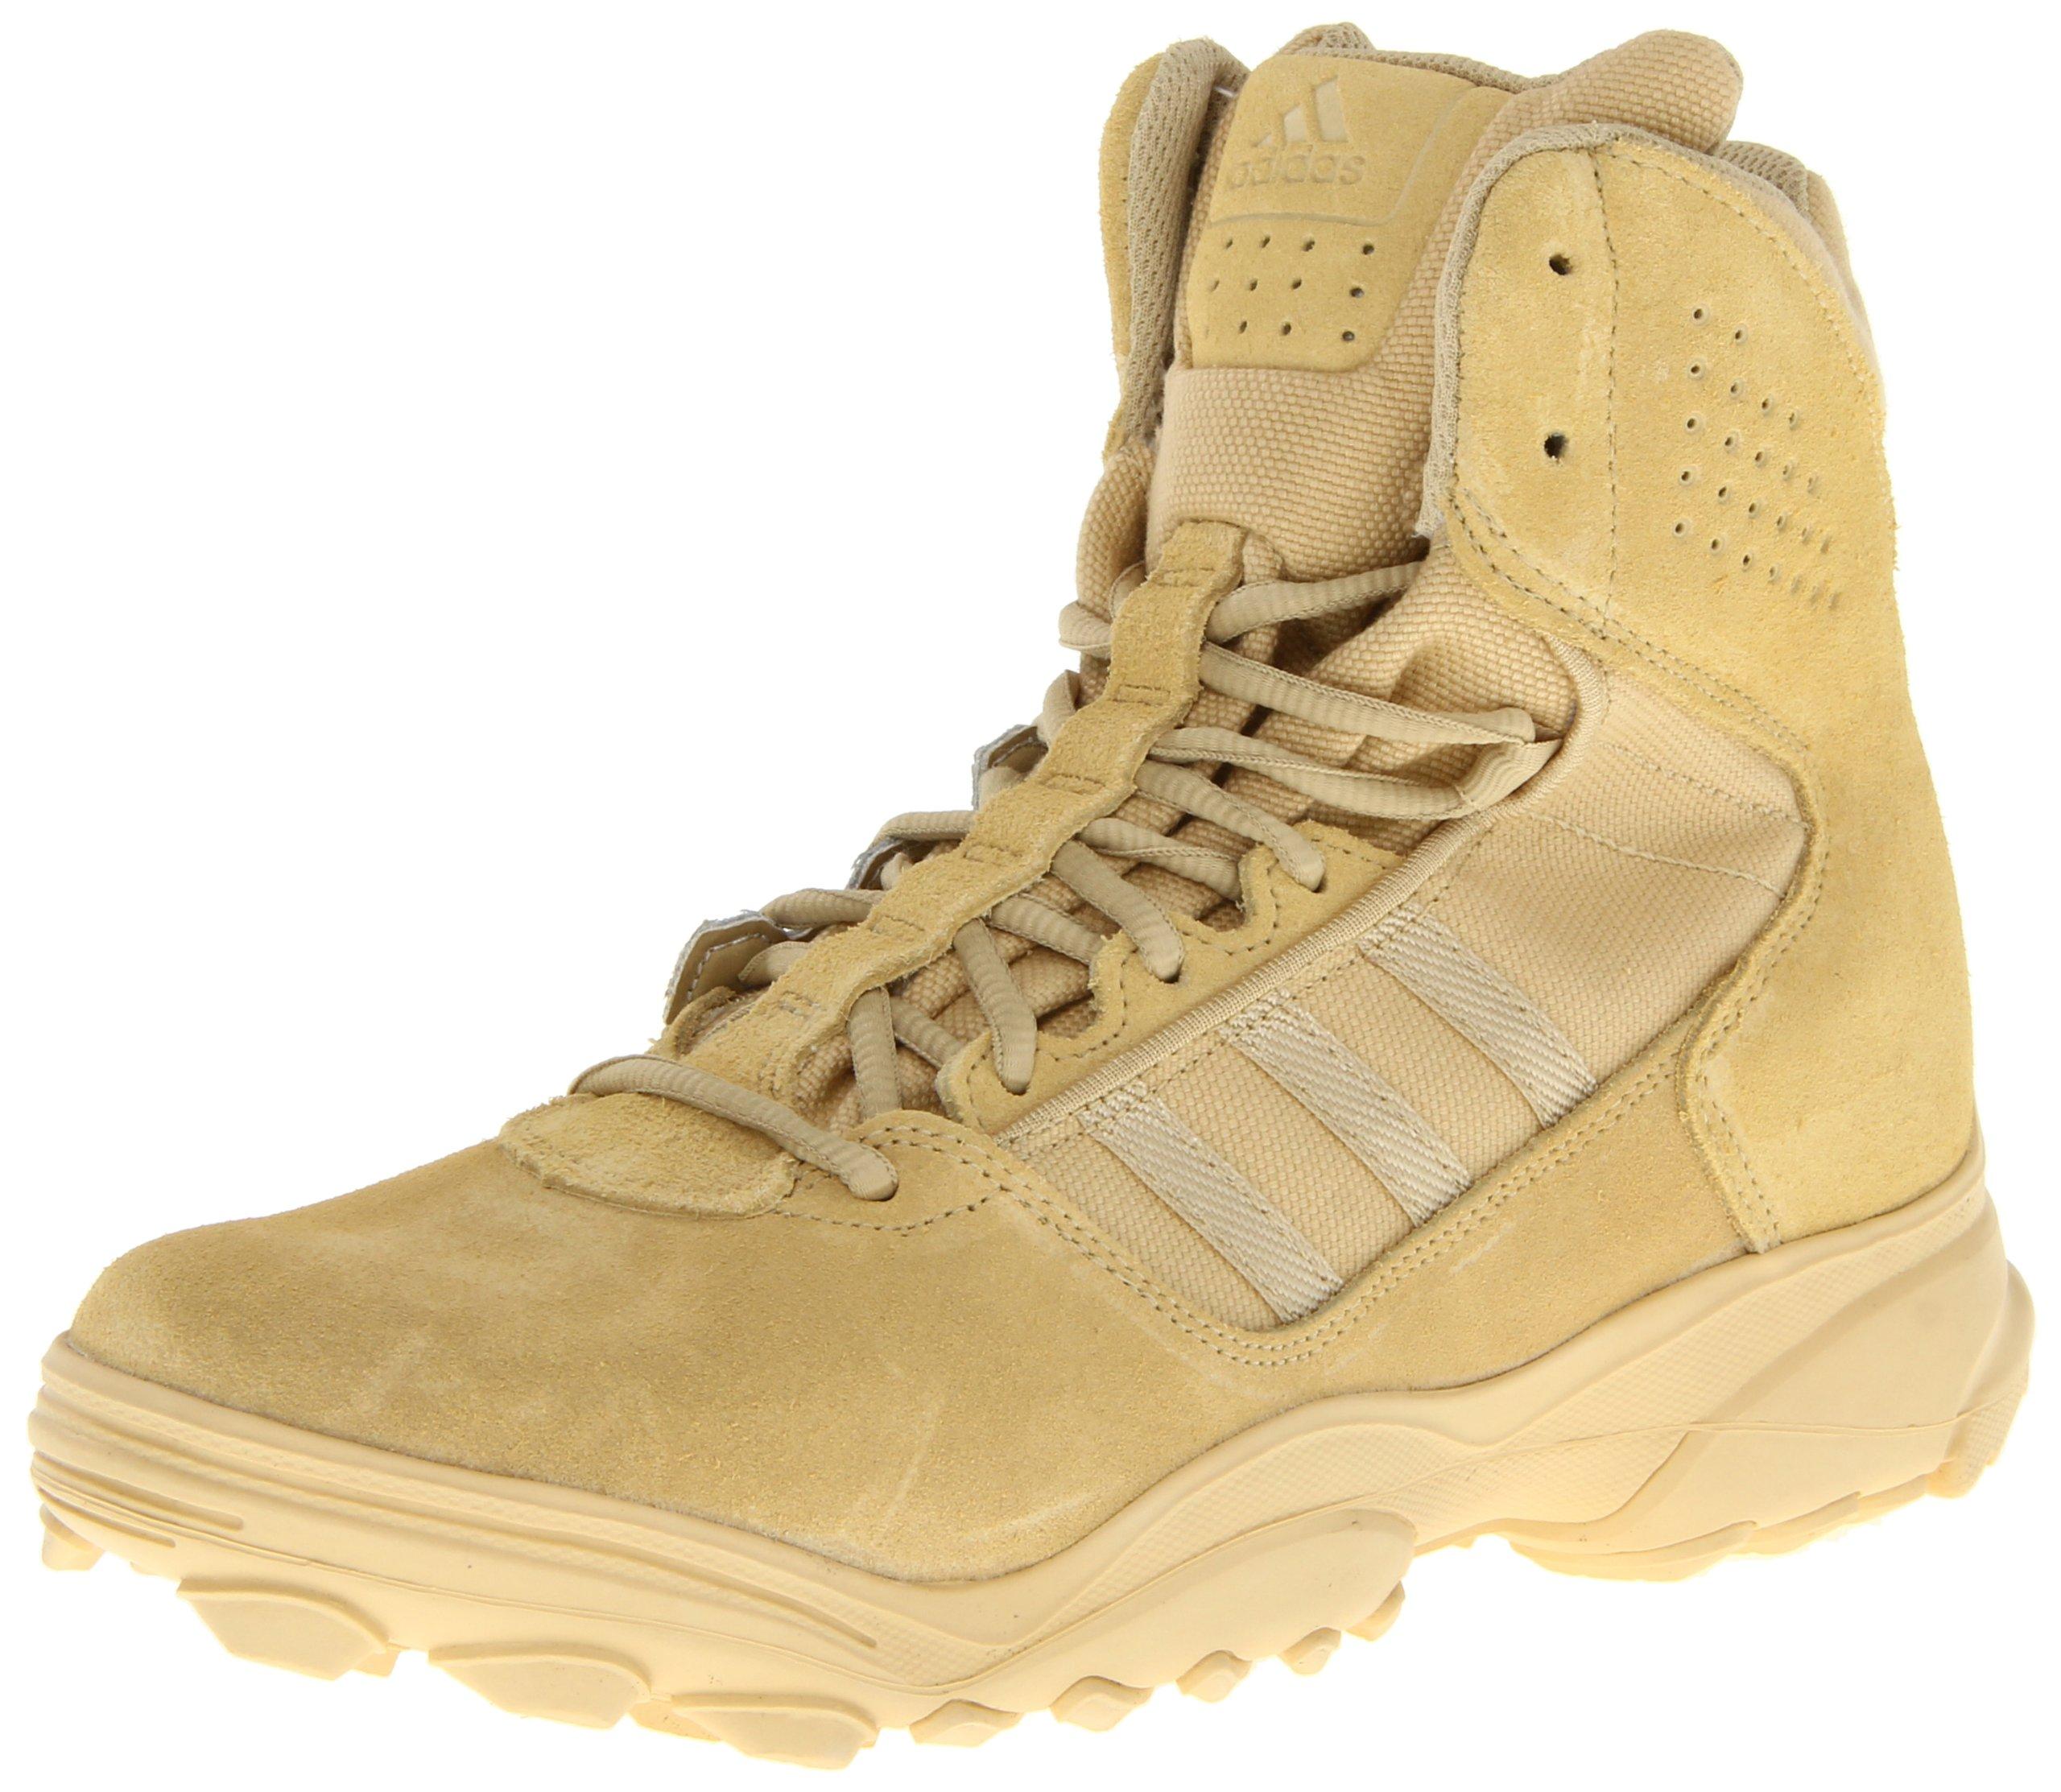 adidas Performance Men's GSG-9.3 Tactical Boot,Hemp Brown/Hemp Brown/Hemp Brown,5 M US